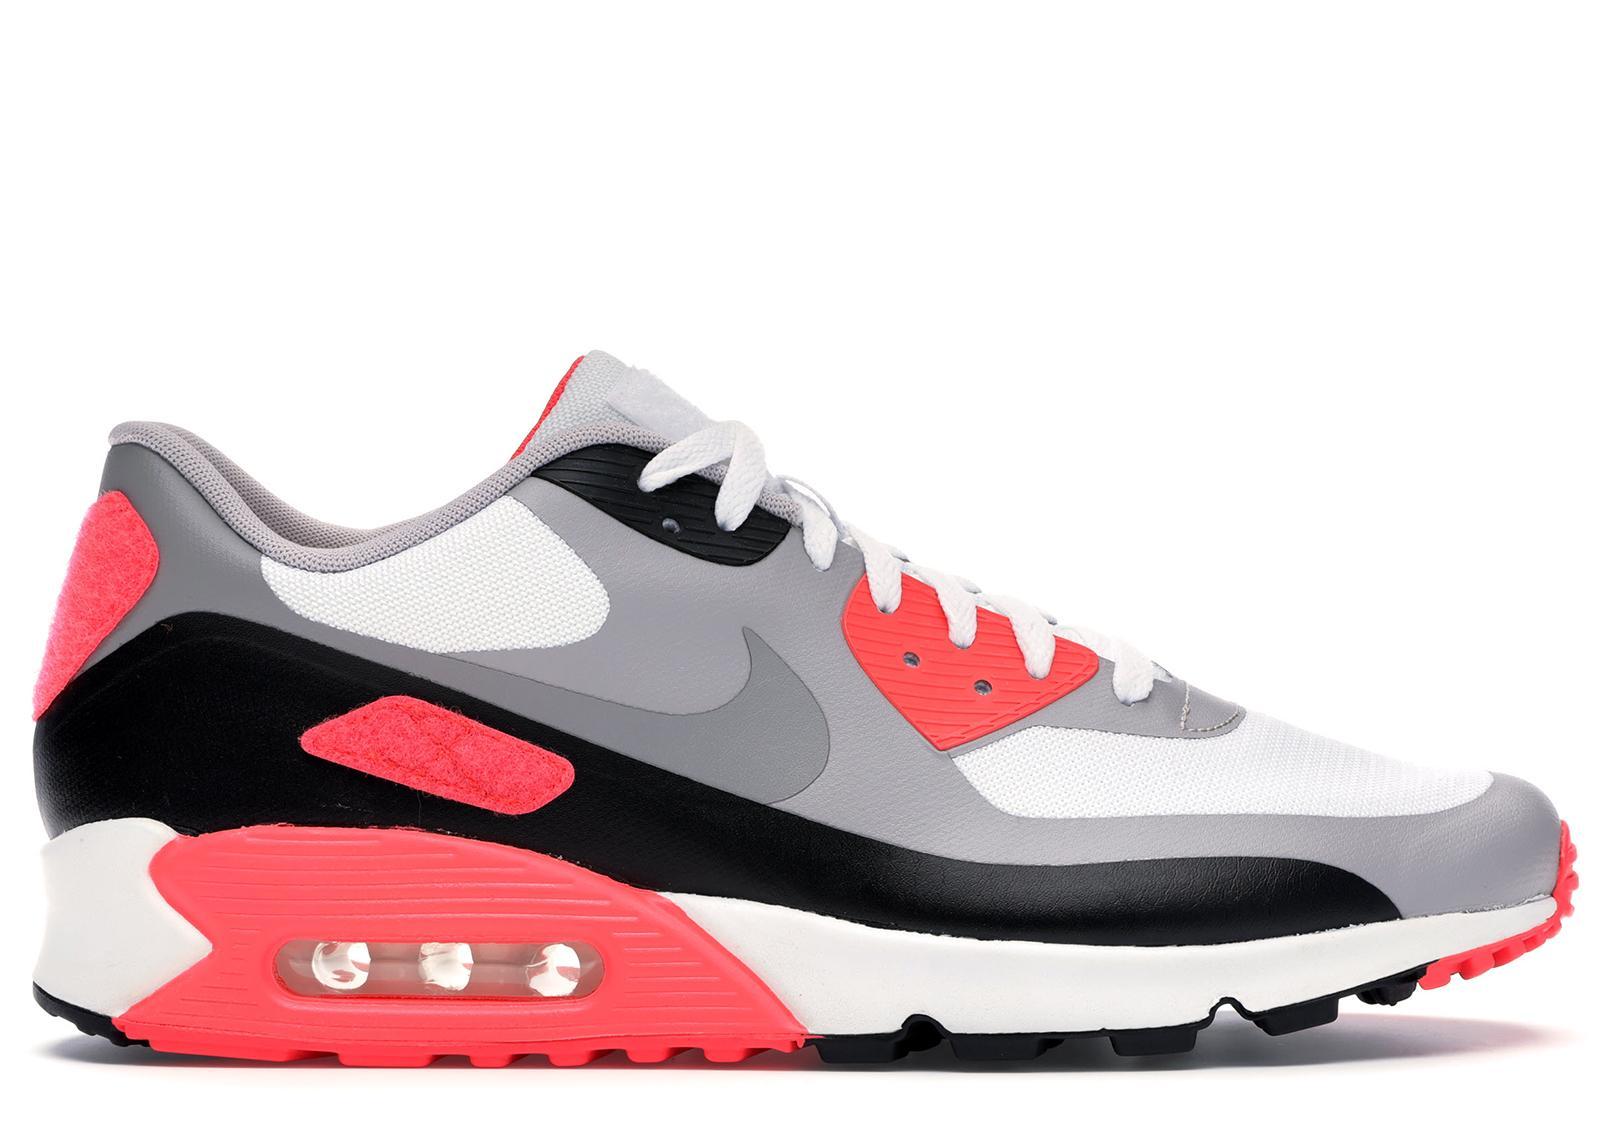 Nike Air Max 90 OG Reverse Infrared | Sneakers